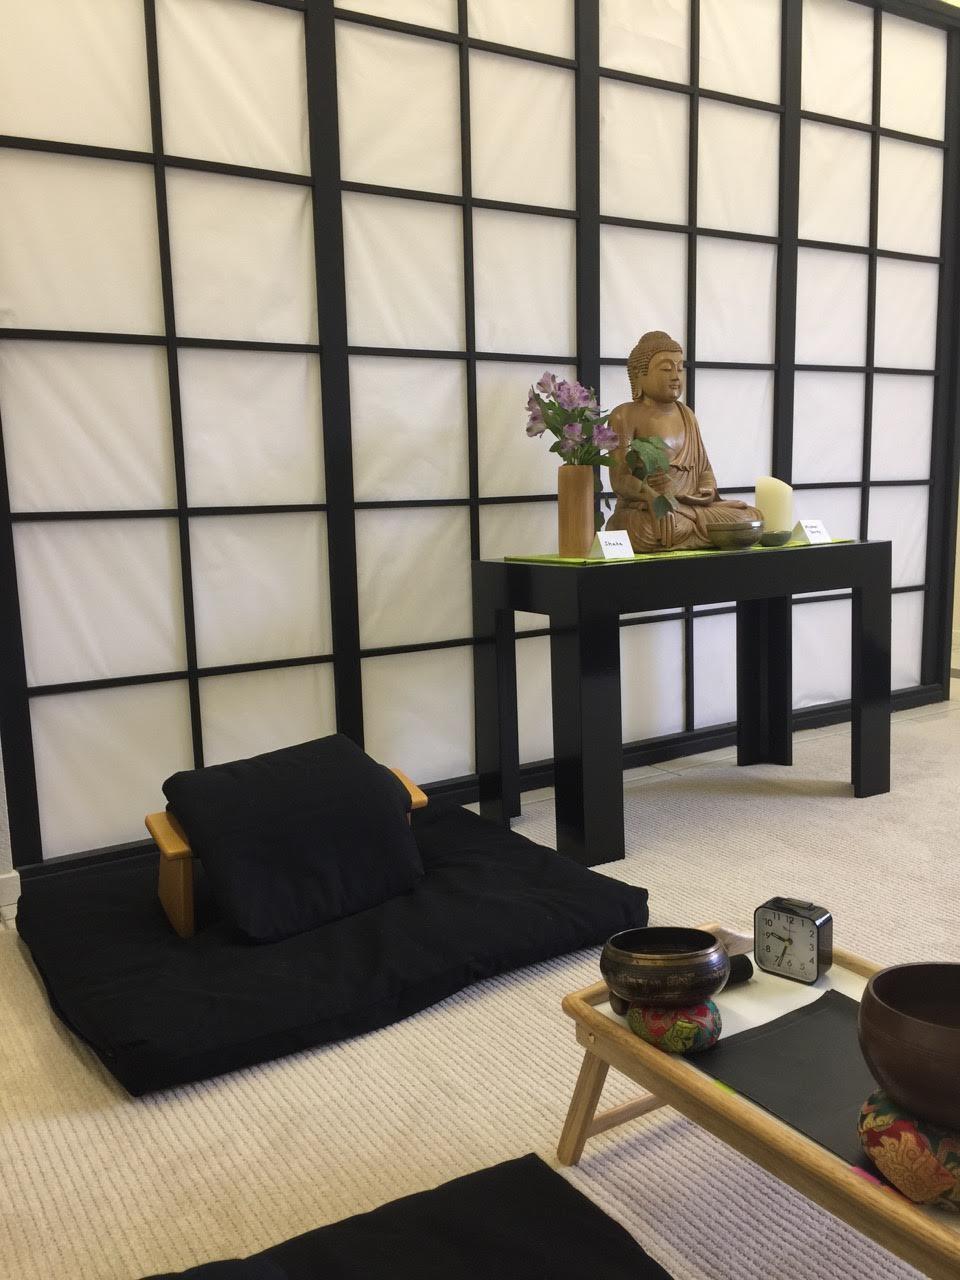 Zen area with Buddha statue